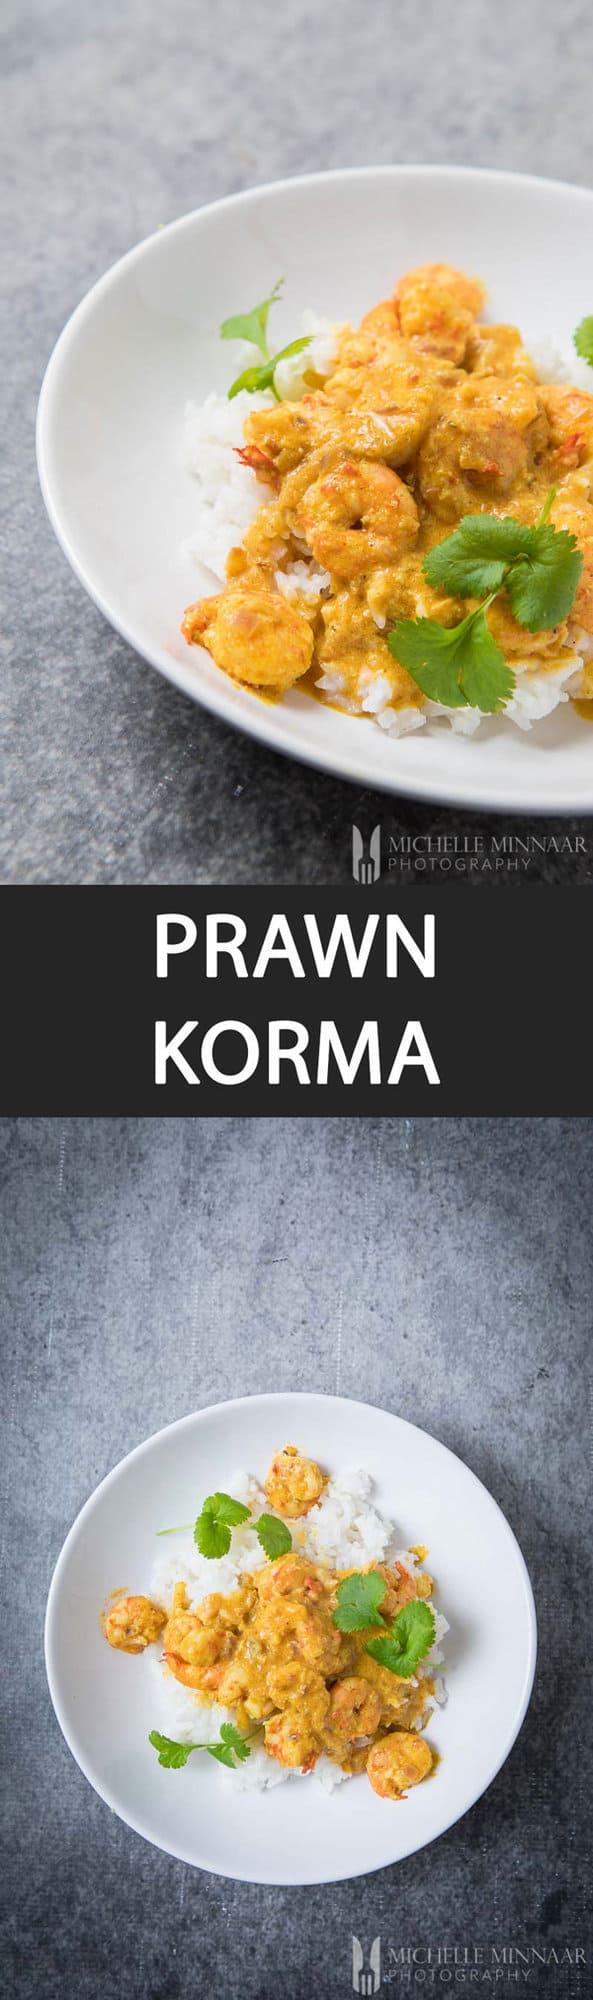 Prawn Korma